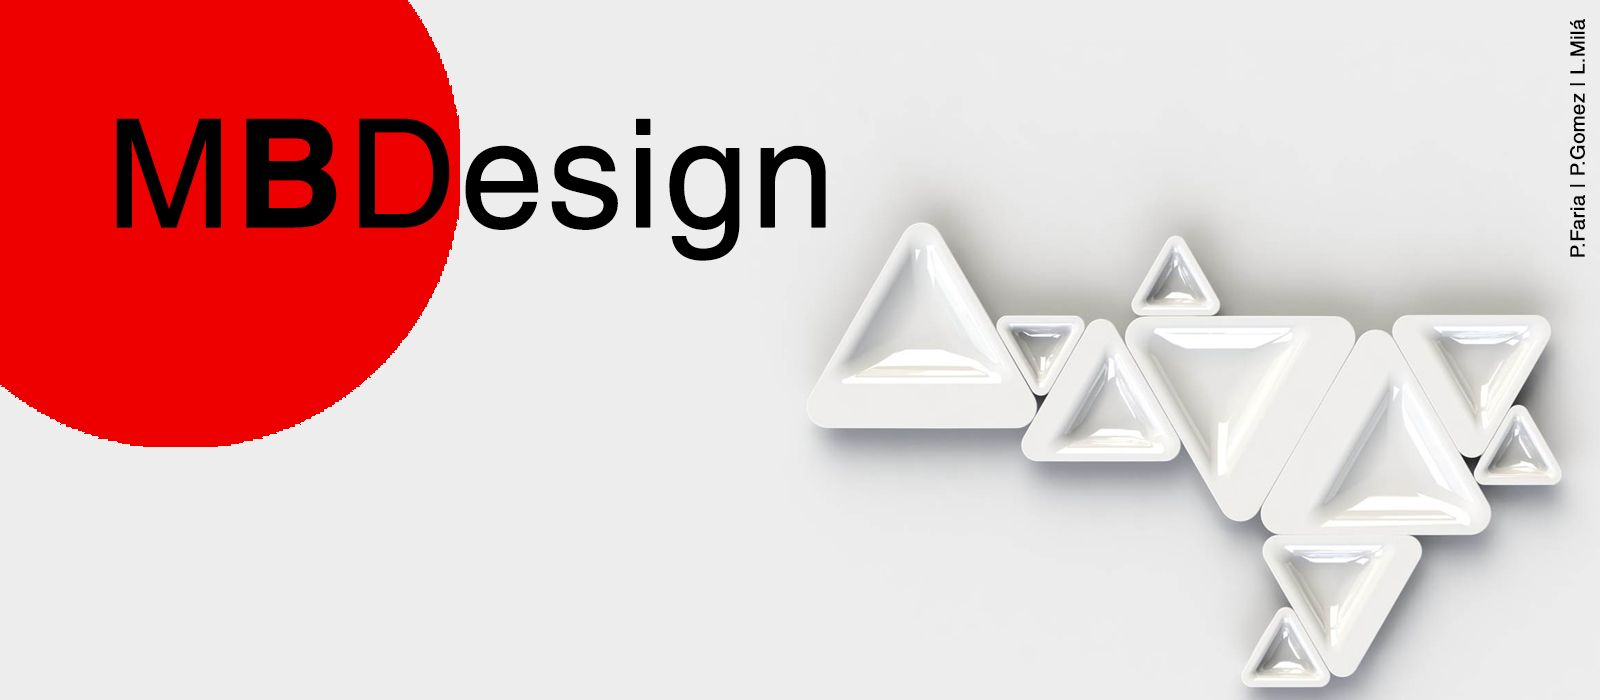 Estudis -  MBDesign_02.jpg